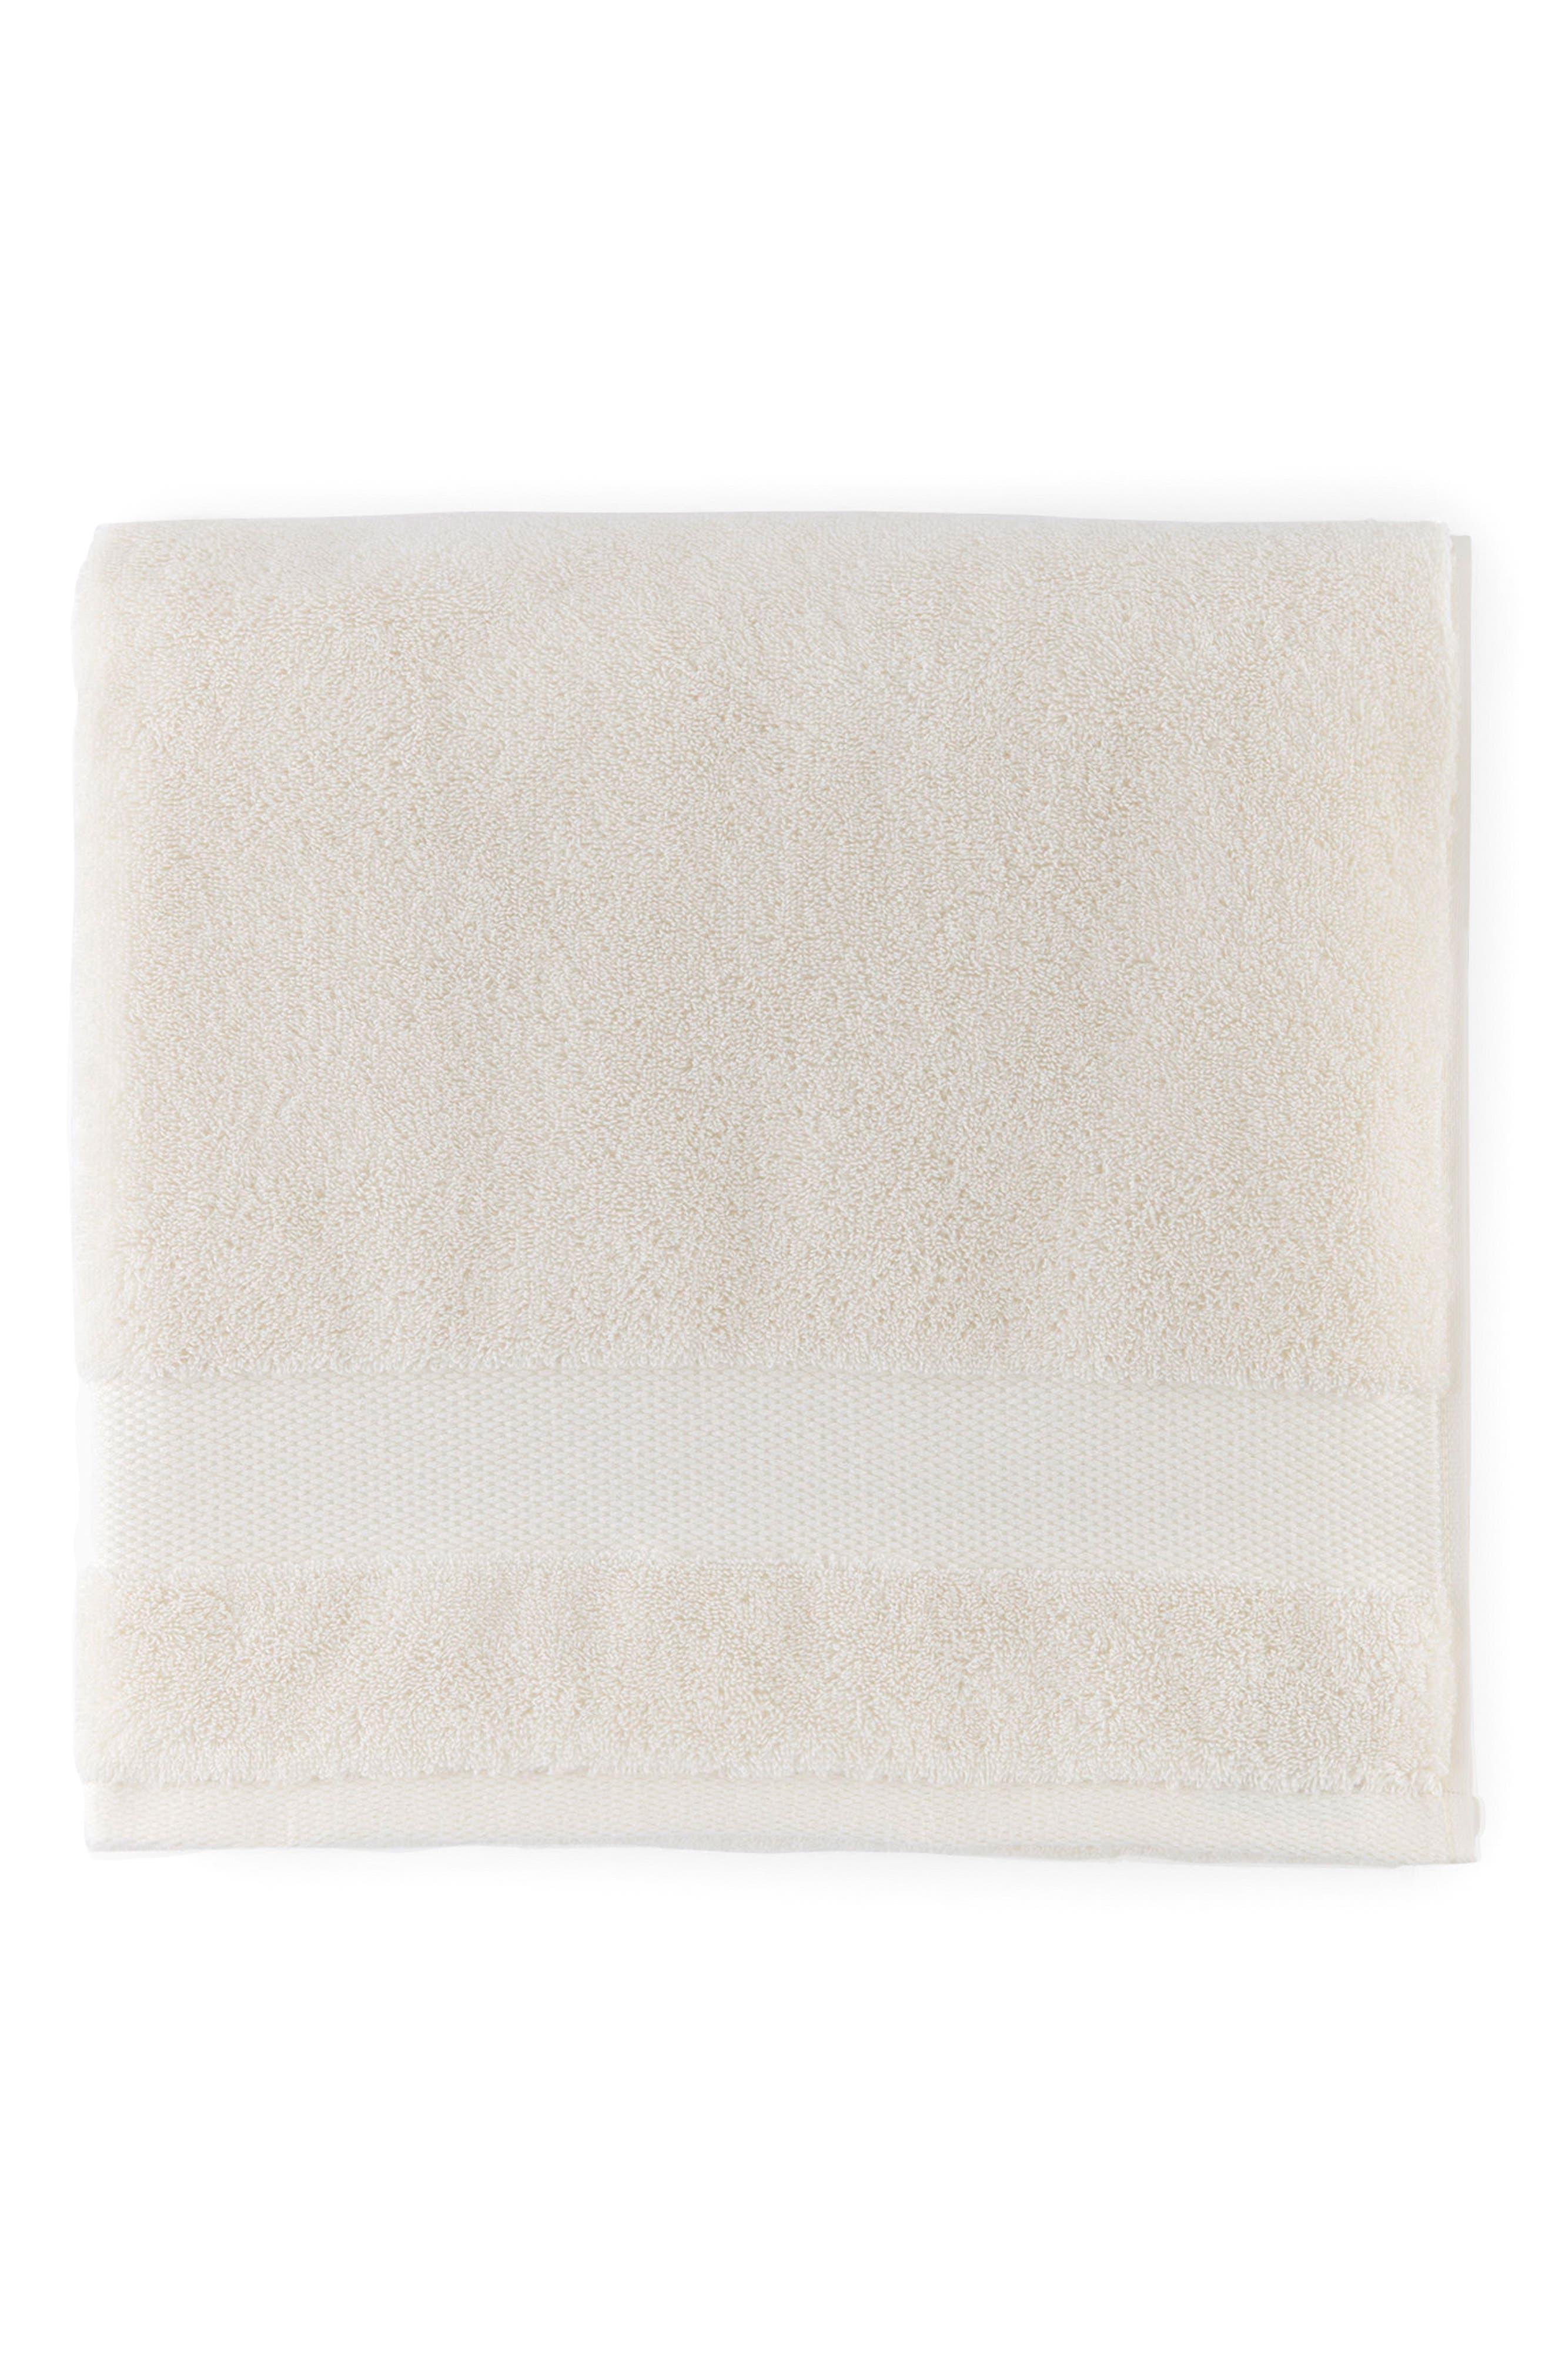 Bello Bath Towel,                         Main,                         color, Ivory